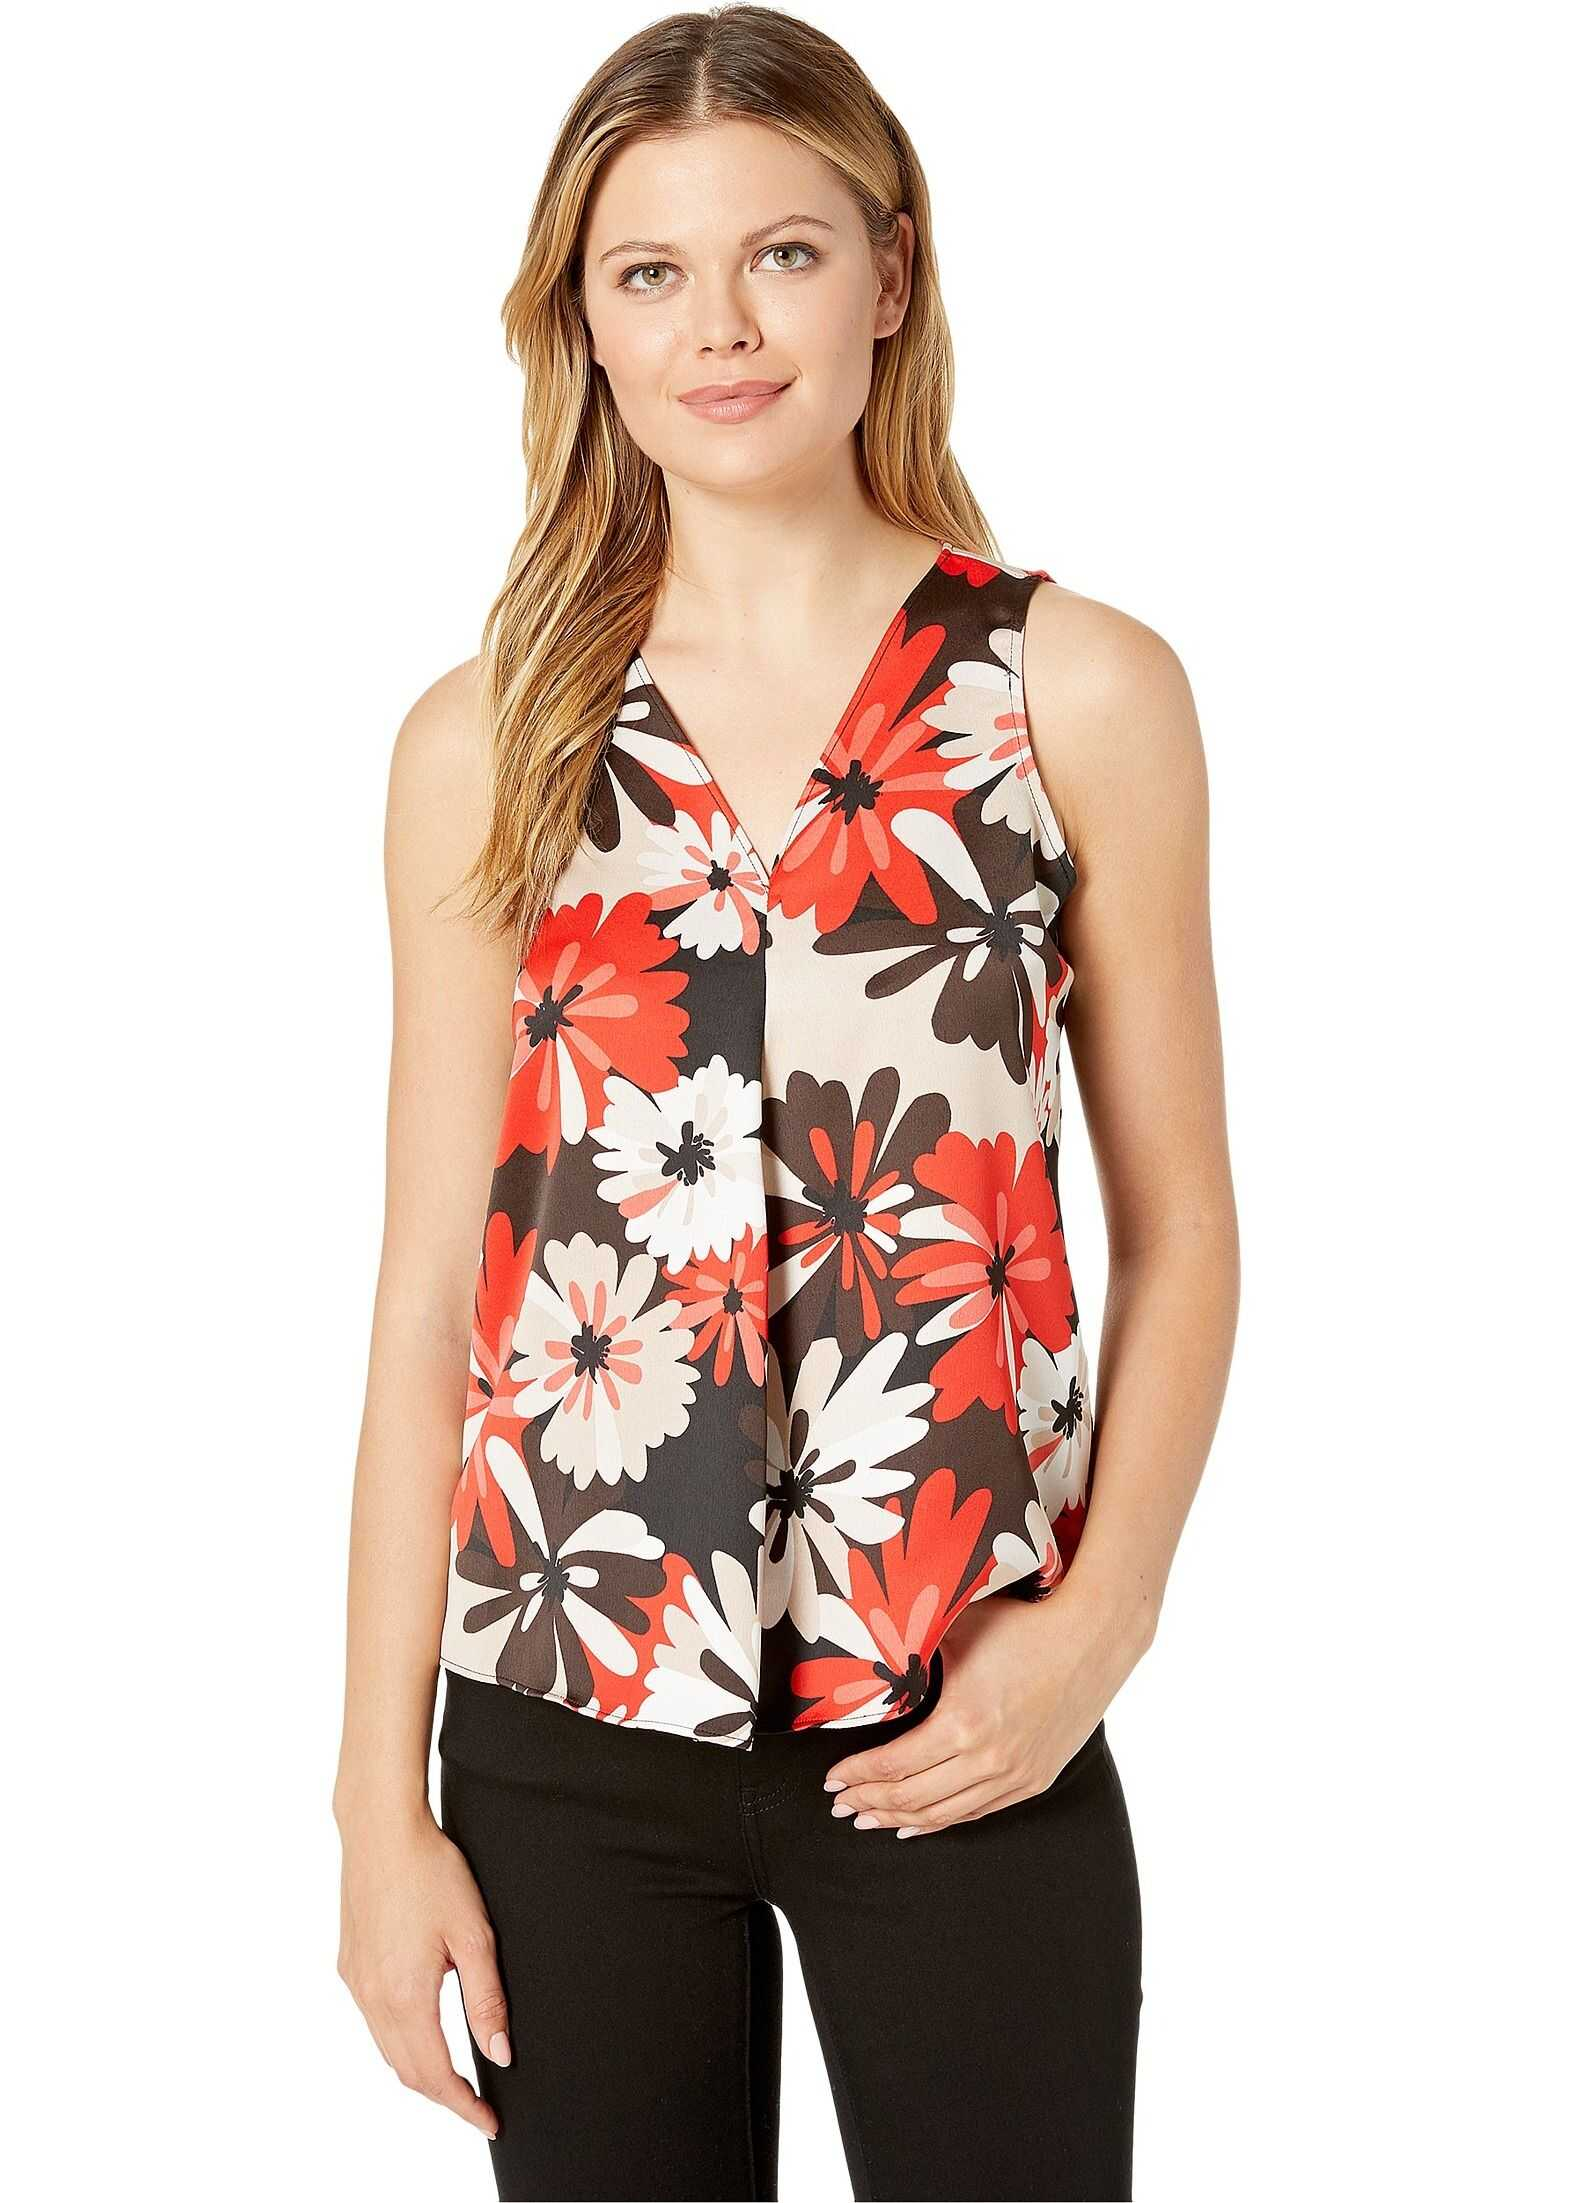 Calvin Klein V-Neck Soft Suiting Sleeveless Top Tango Multi